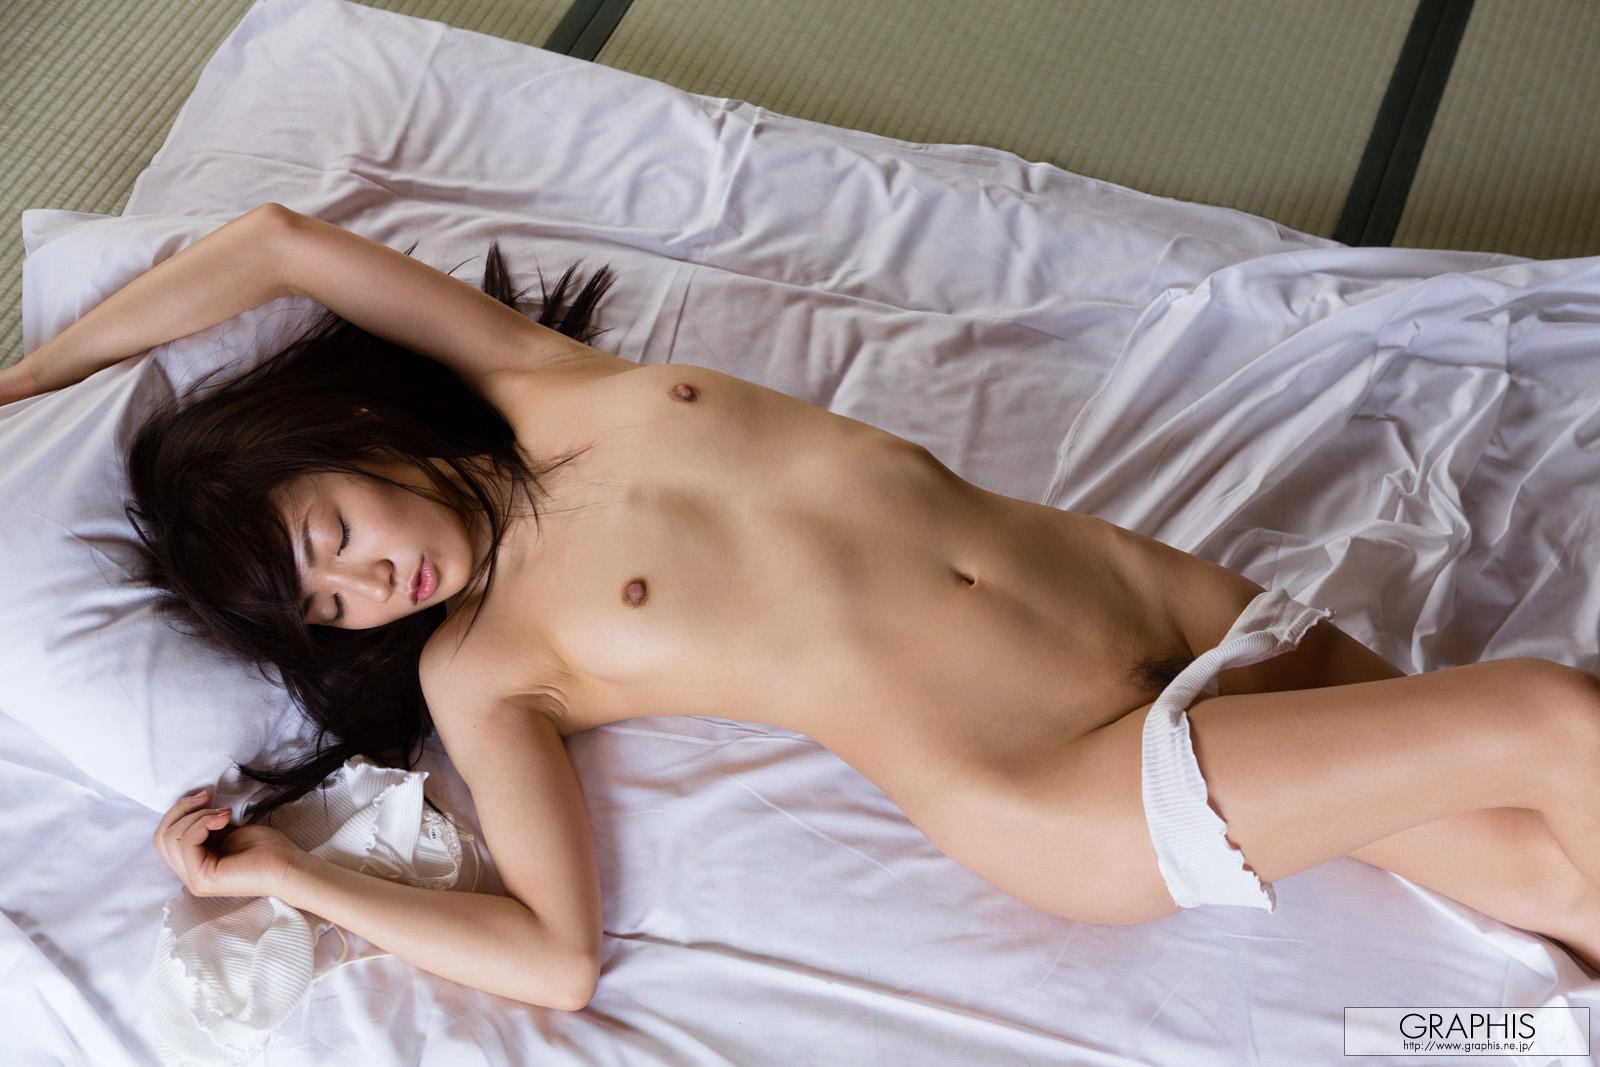 image http://scanlover.com/assets/images/272-BDJAW8q2uVchSvRO.jpeg